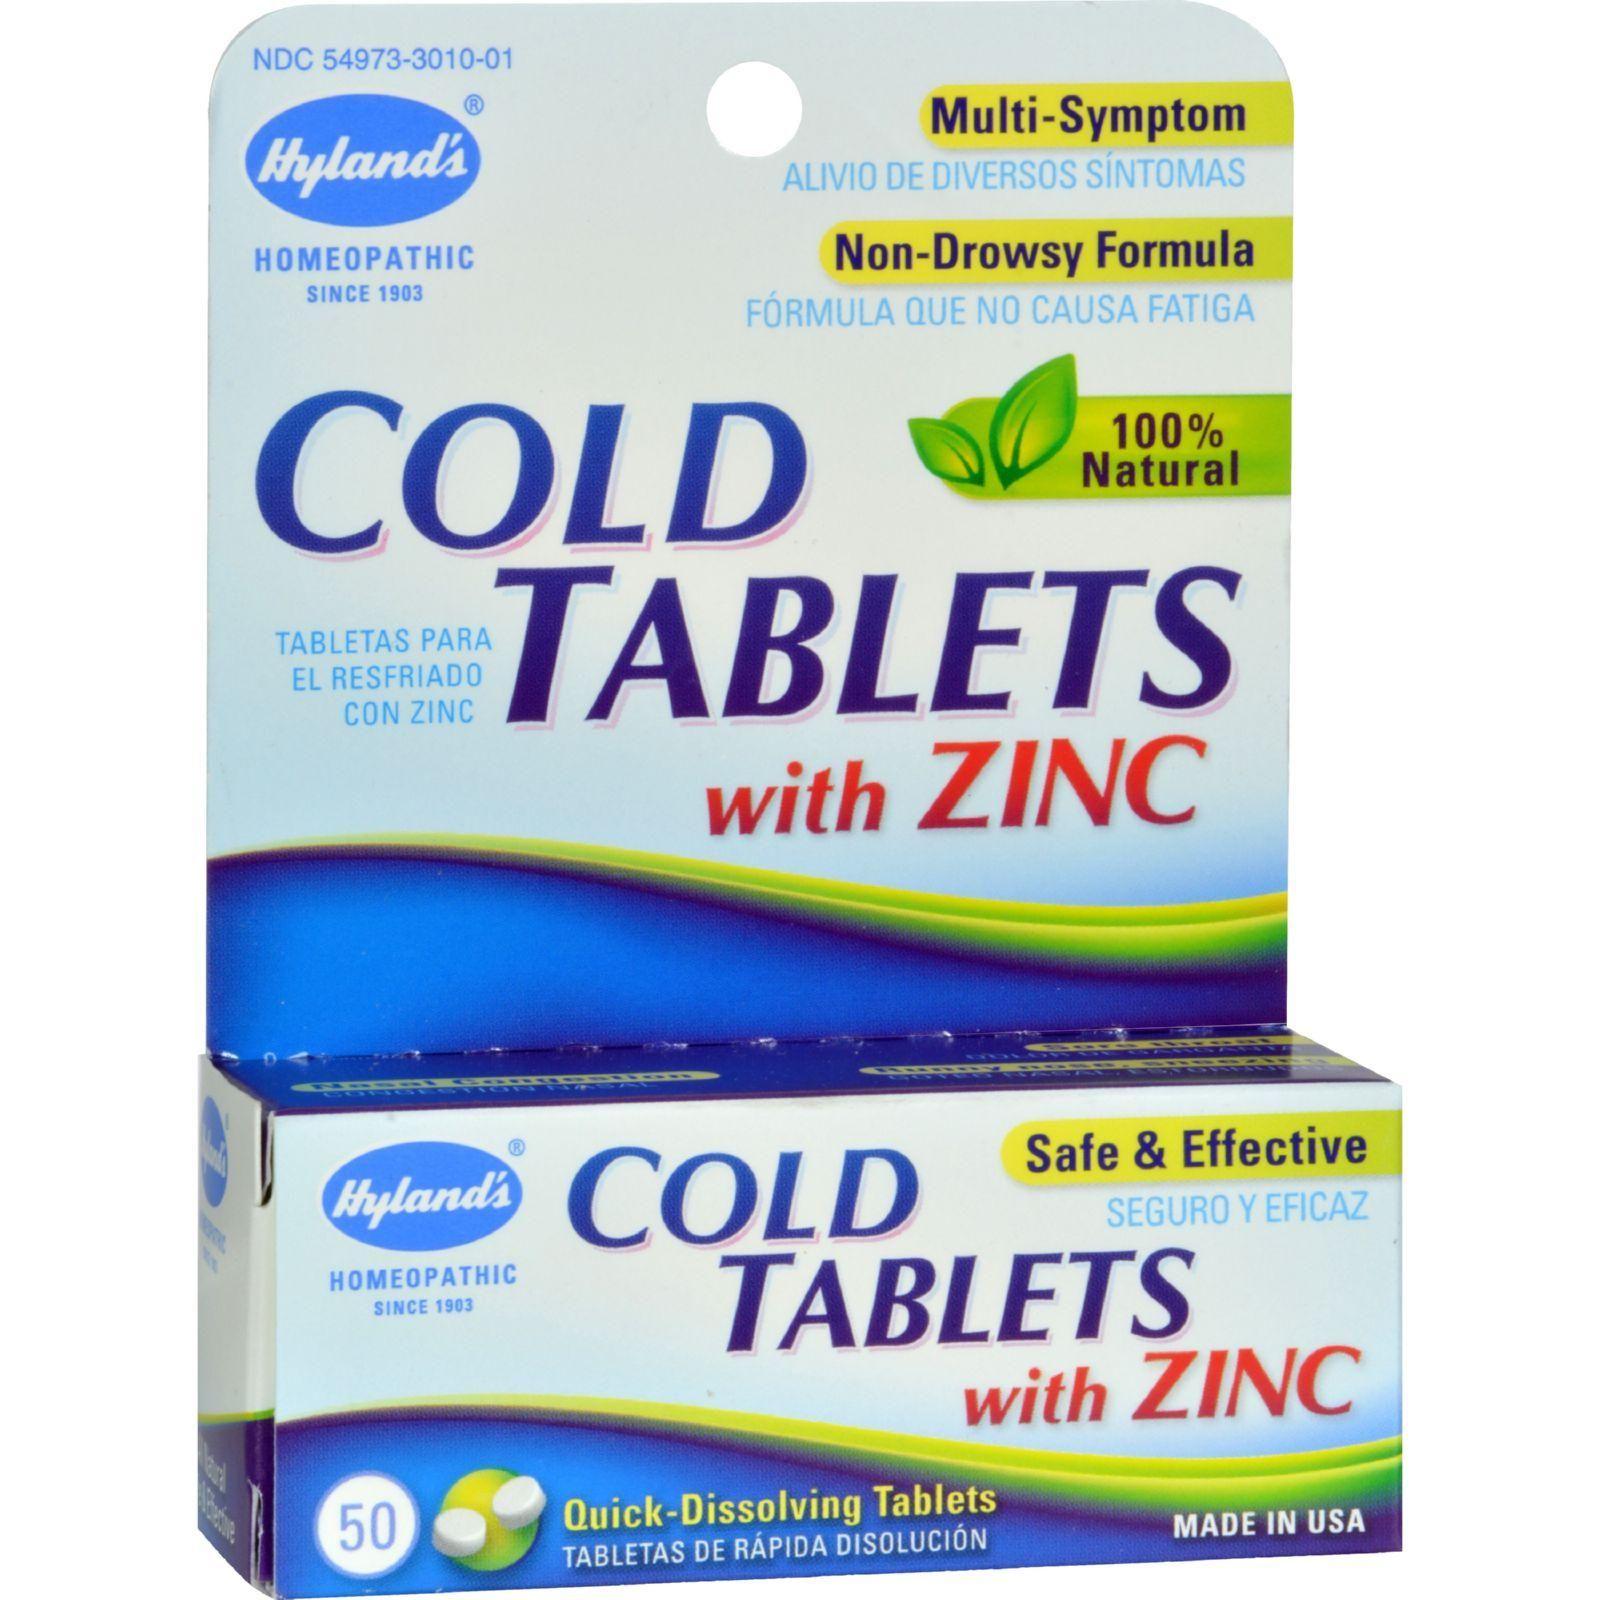 Hyland S Cold Tablets With Zinc Description 100 Natural No Side